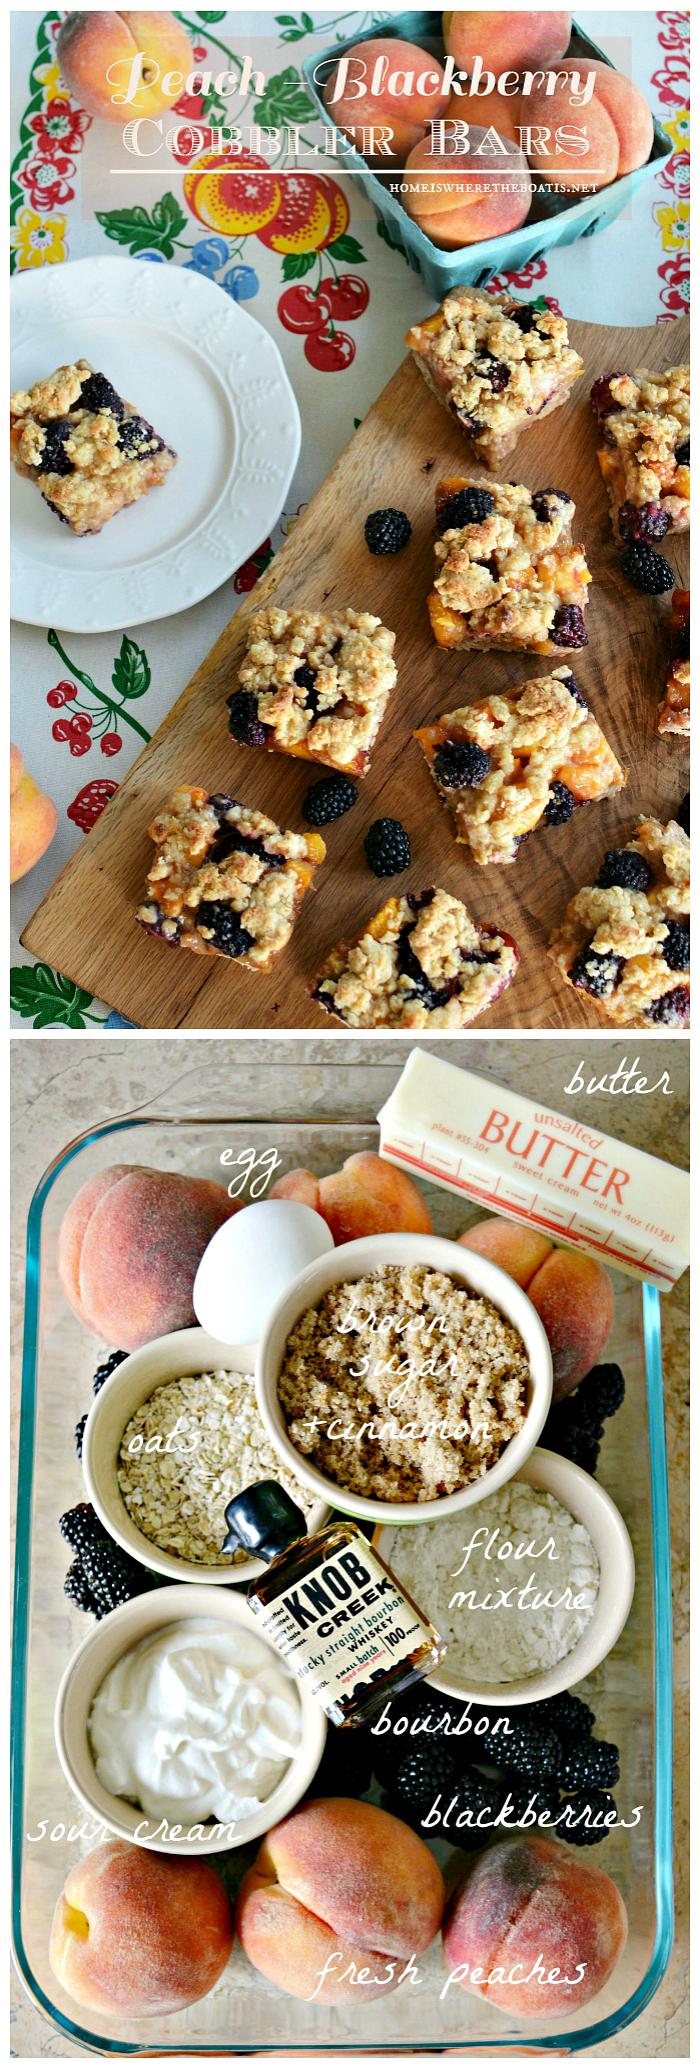 Peach-Blackberry Cobbler Bars | ©homeiswheretheboatis.net #recipes #peaches #desserts #summer